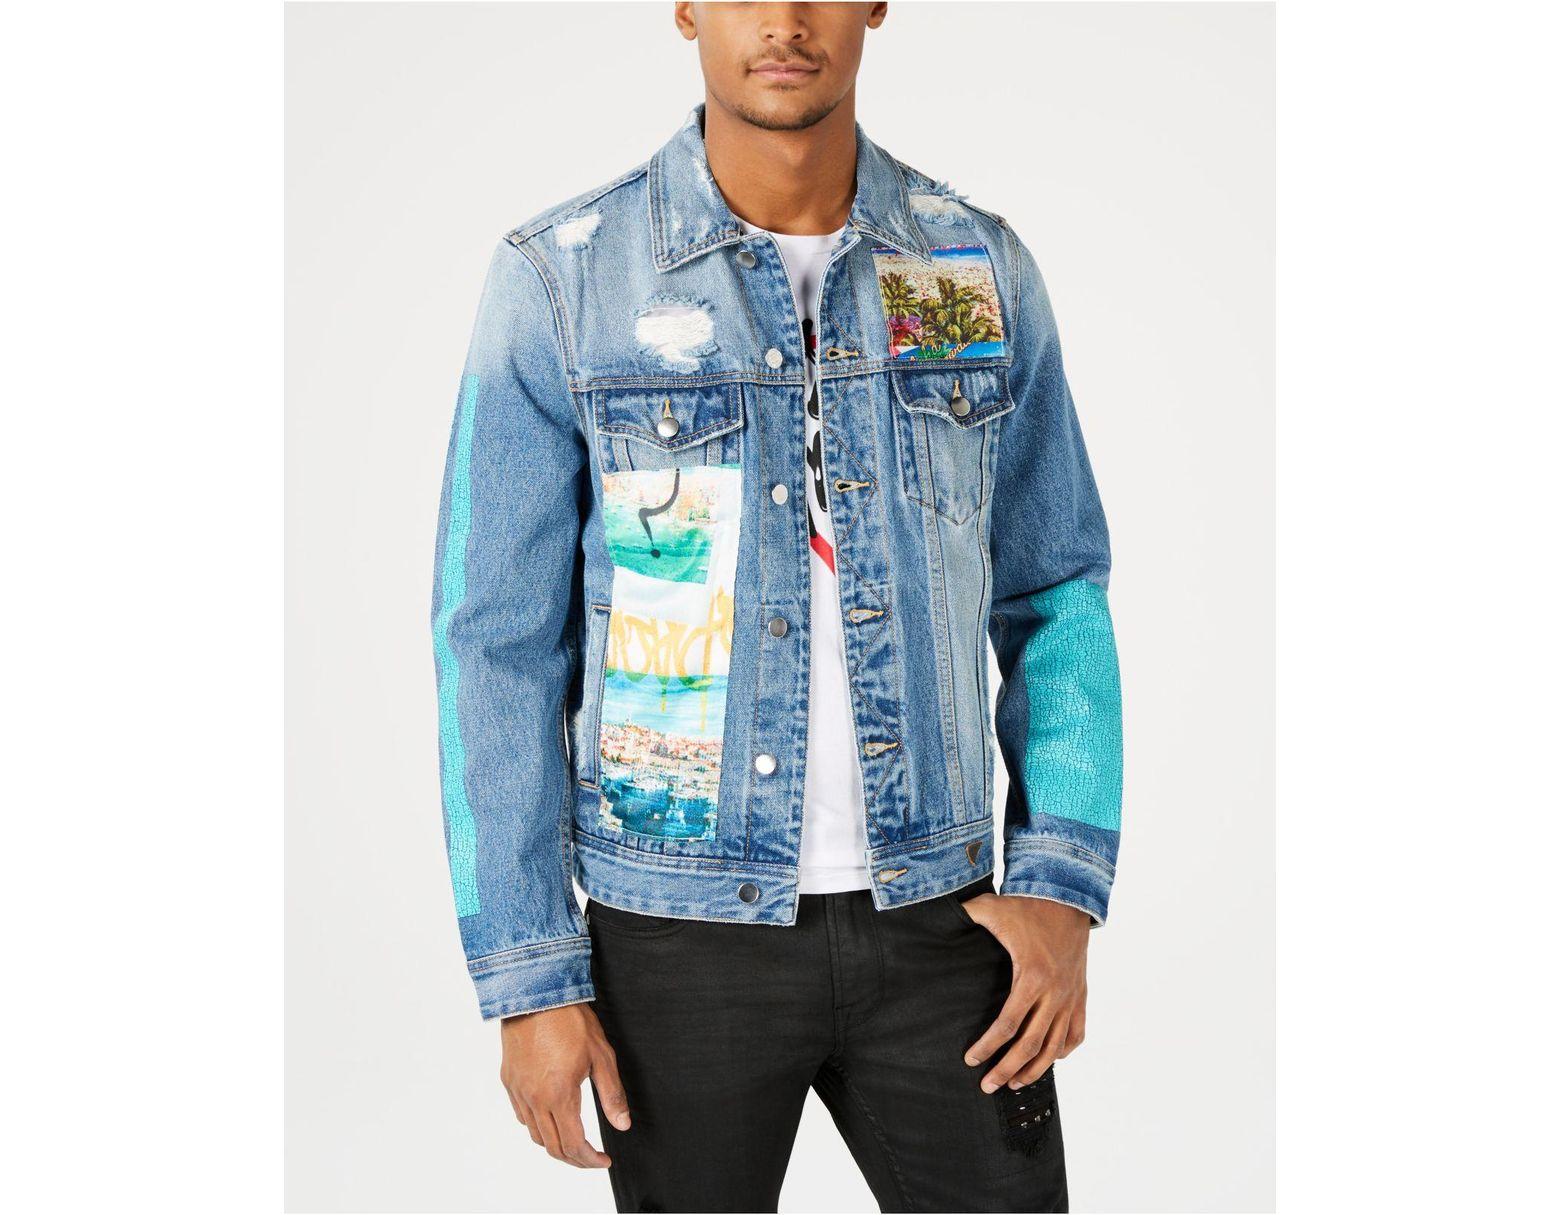 0c6ecf7069d Guess Destructed Patch Denim Jacket in Blue for Men - Lyst